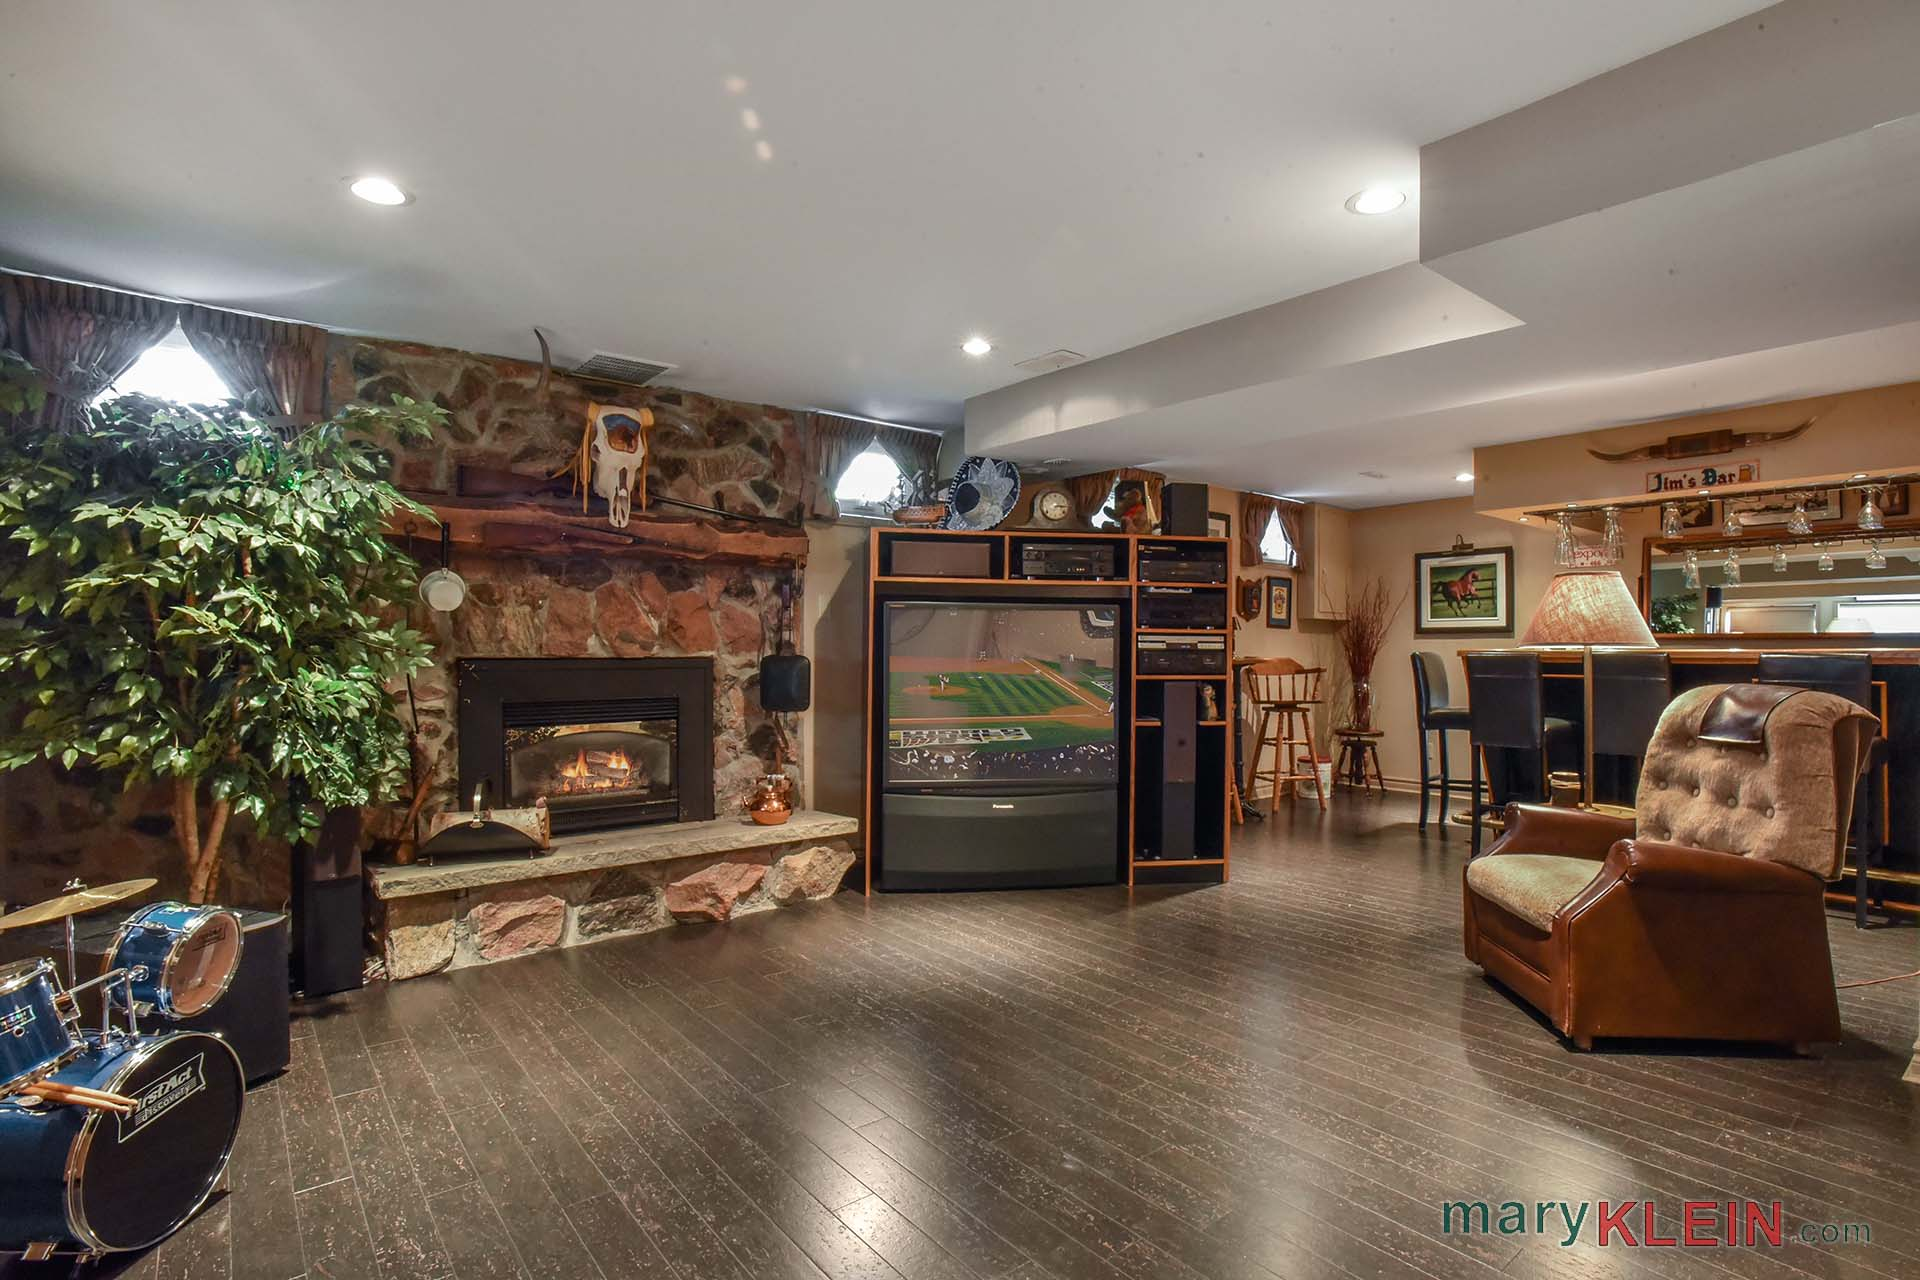 Rec room, gas fireplace, man cave